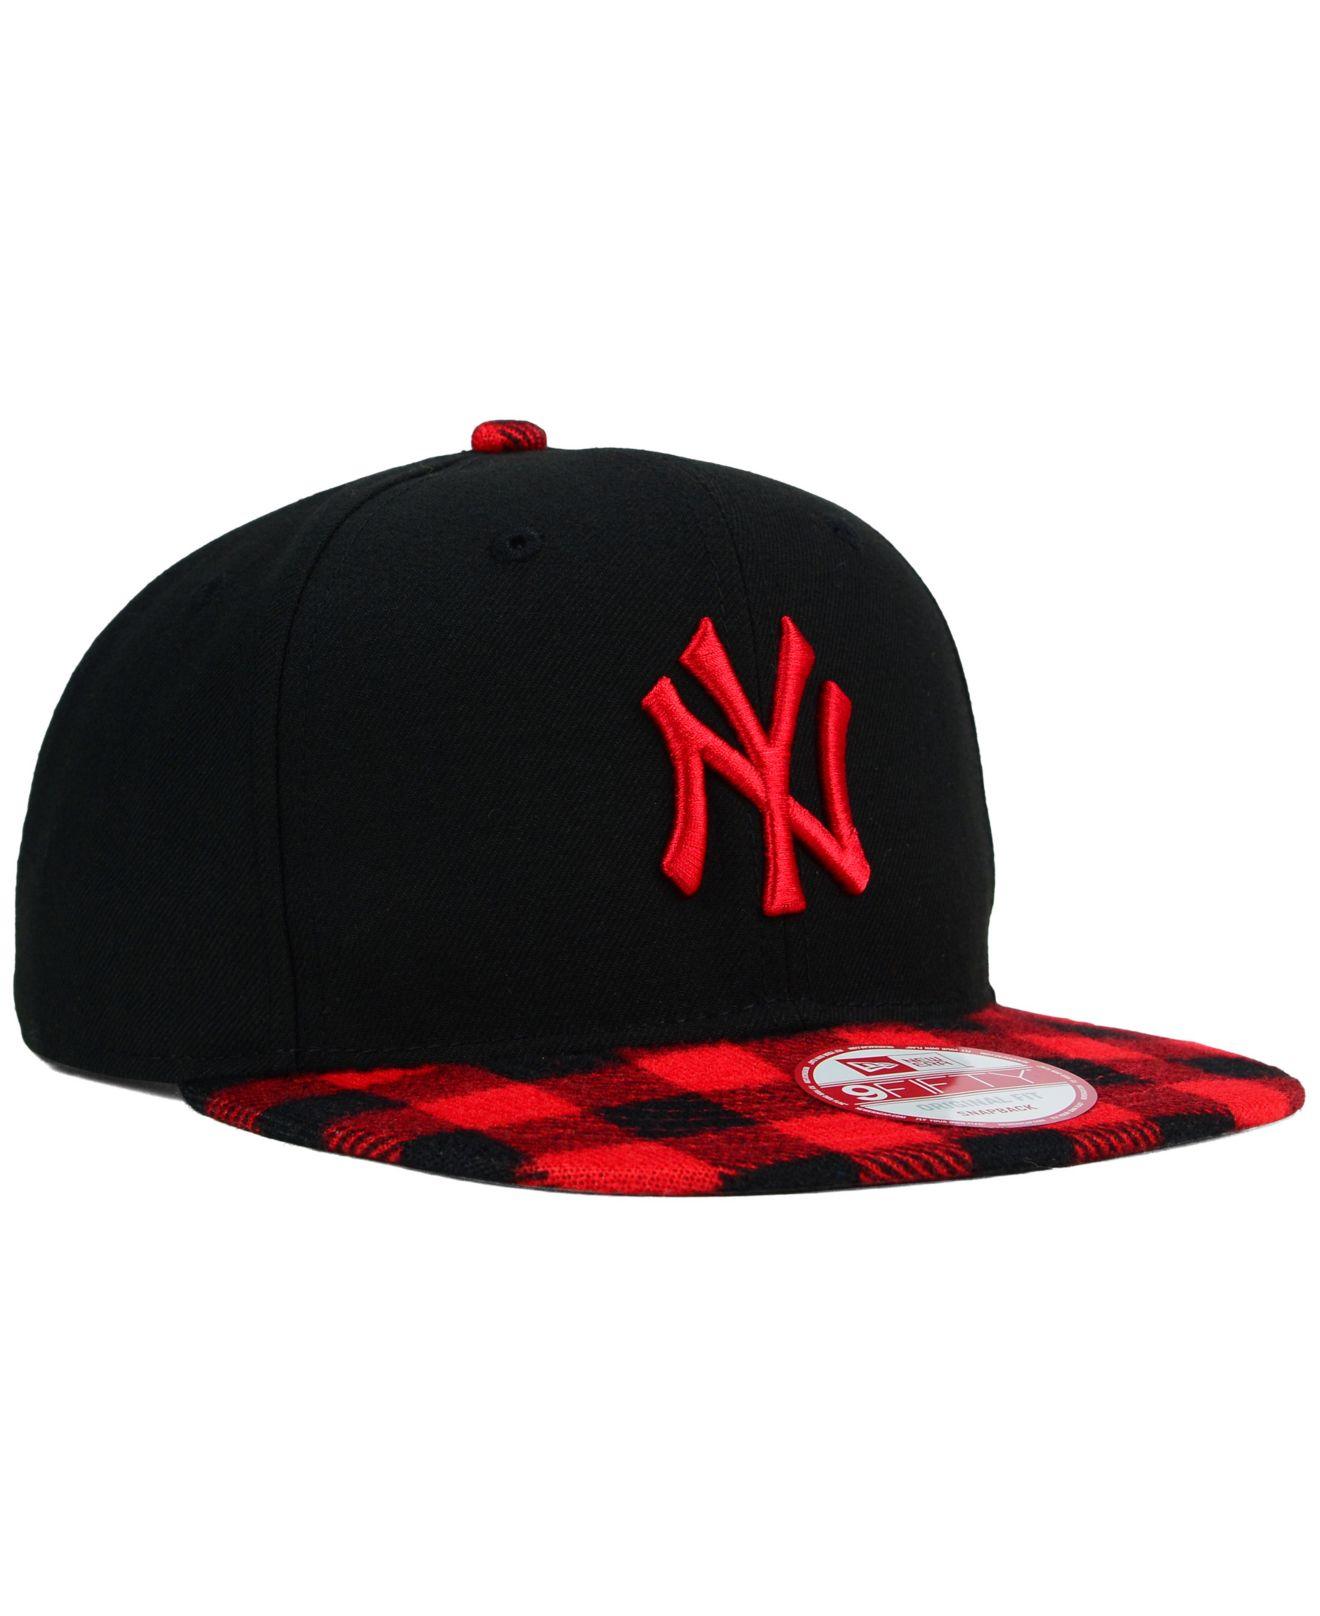 c44d4a85362 Lyst - KTZ New York Yankees Premium Plaid 9fifty Snapback Cap in Red ...